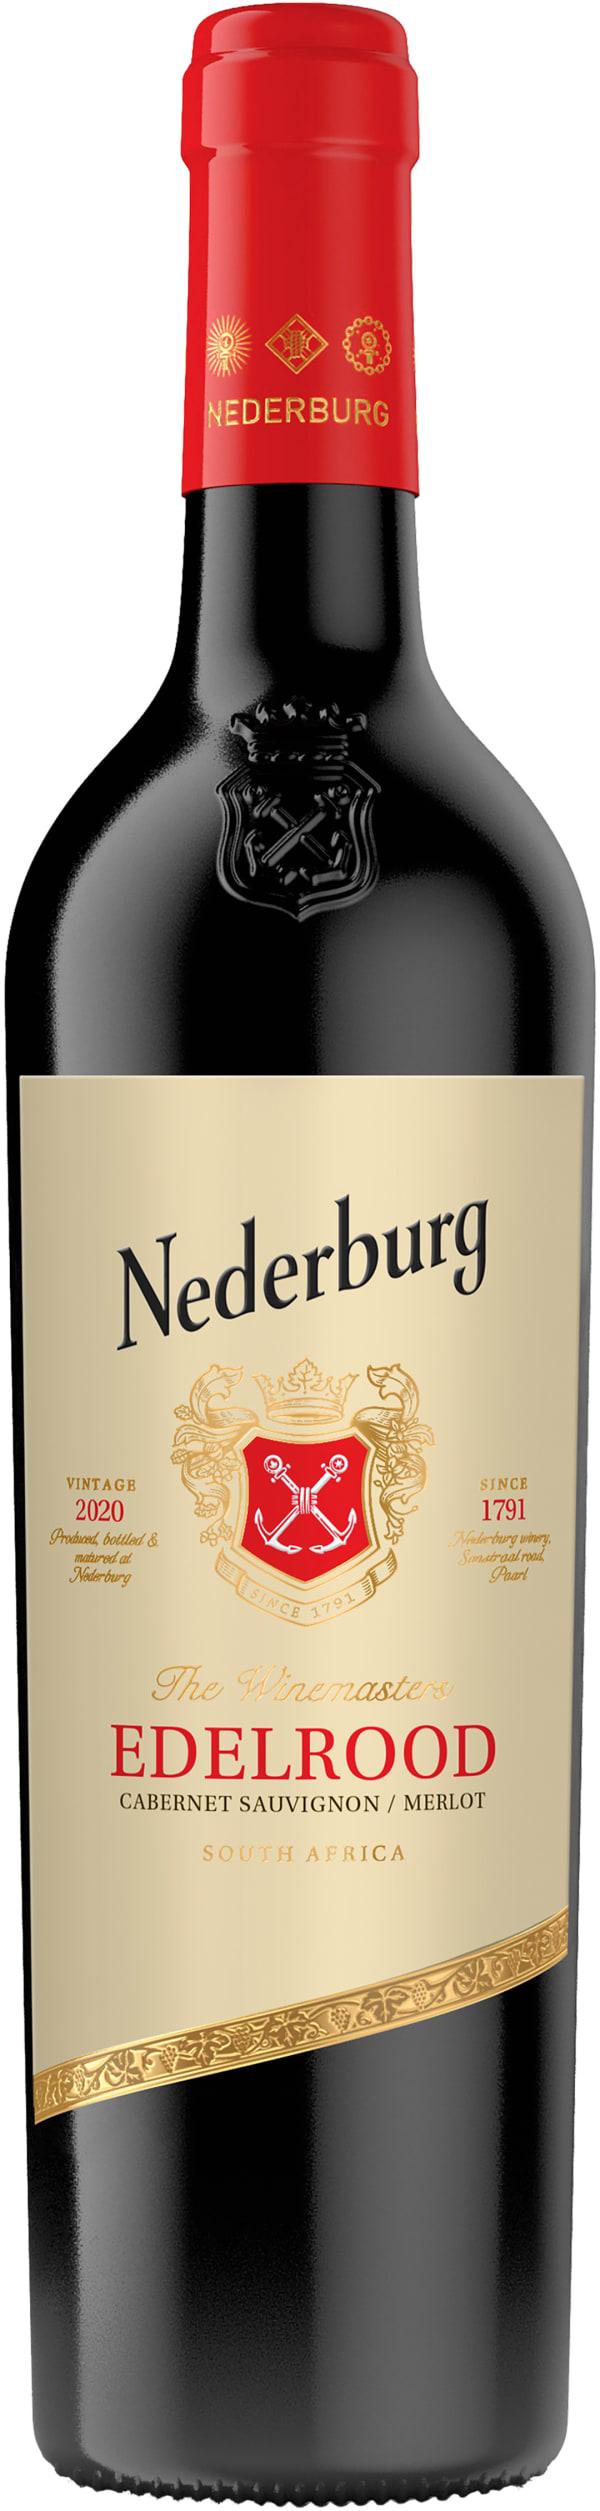 Nederburg Winemaster's Edelrood 2018